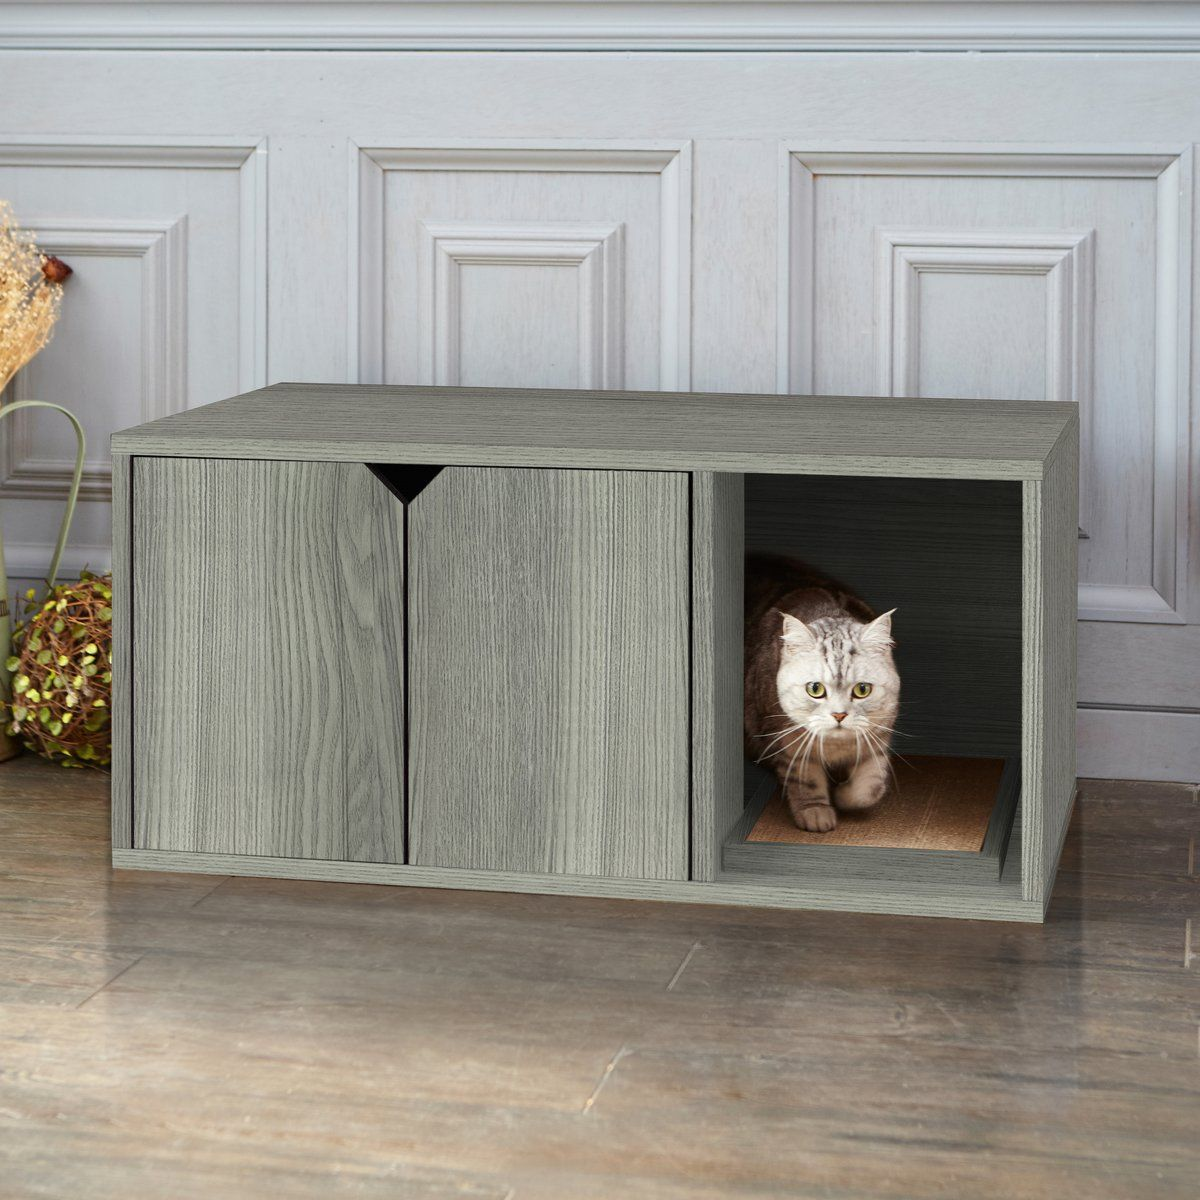 Cat Litter Box Enclosure Grey Cat Litter Box Furniture Litter Box Furniture Modern Cat Furniture